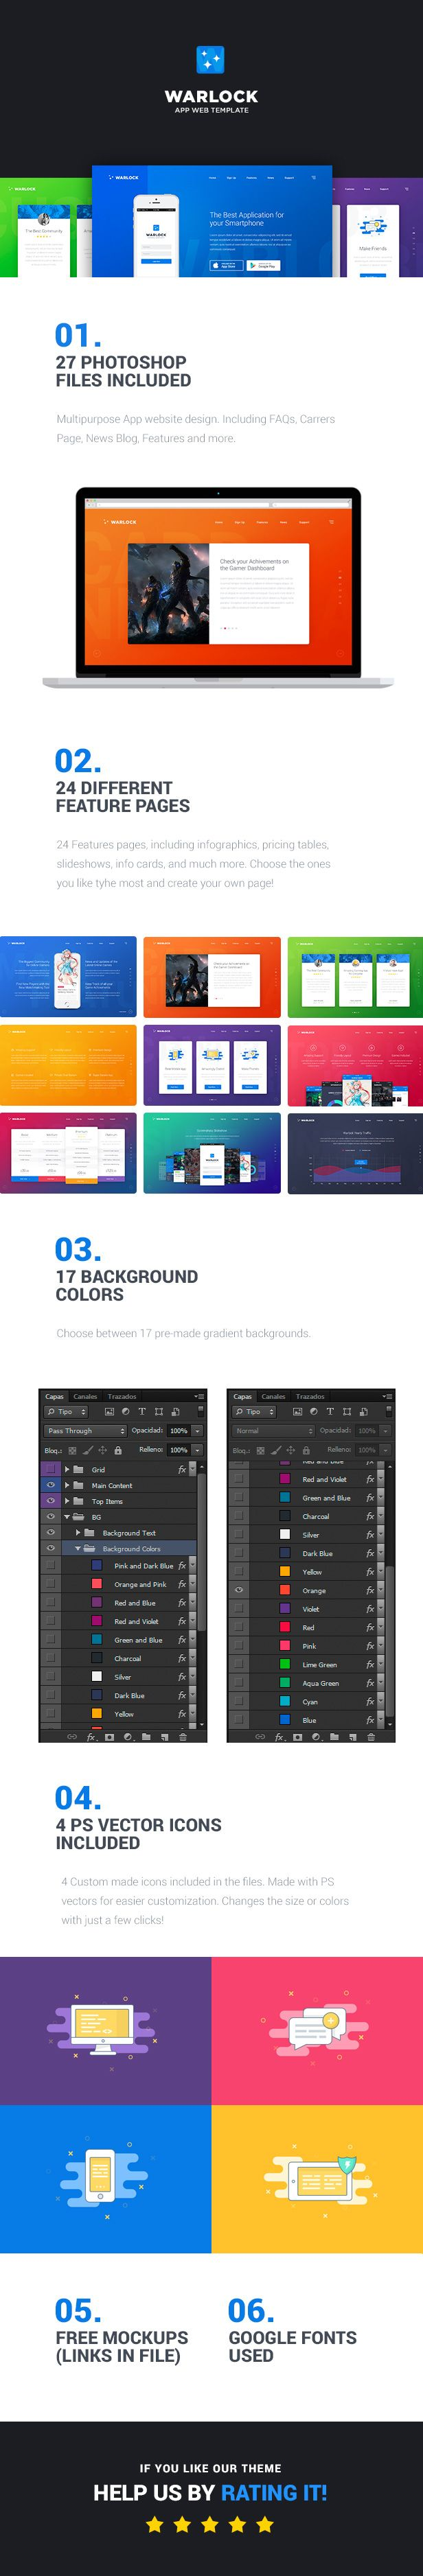 Warlock App PSD Template - 7